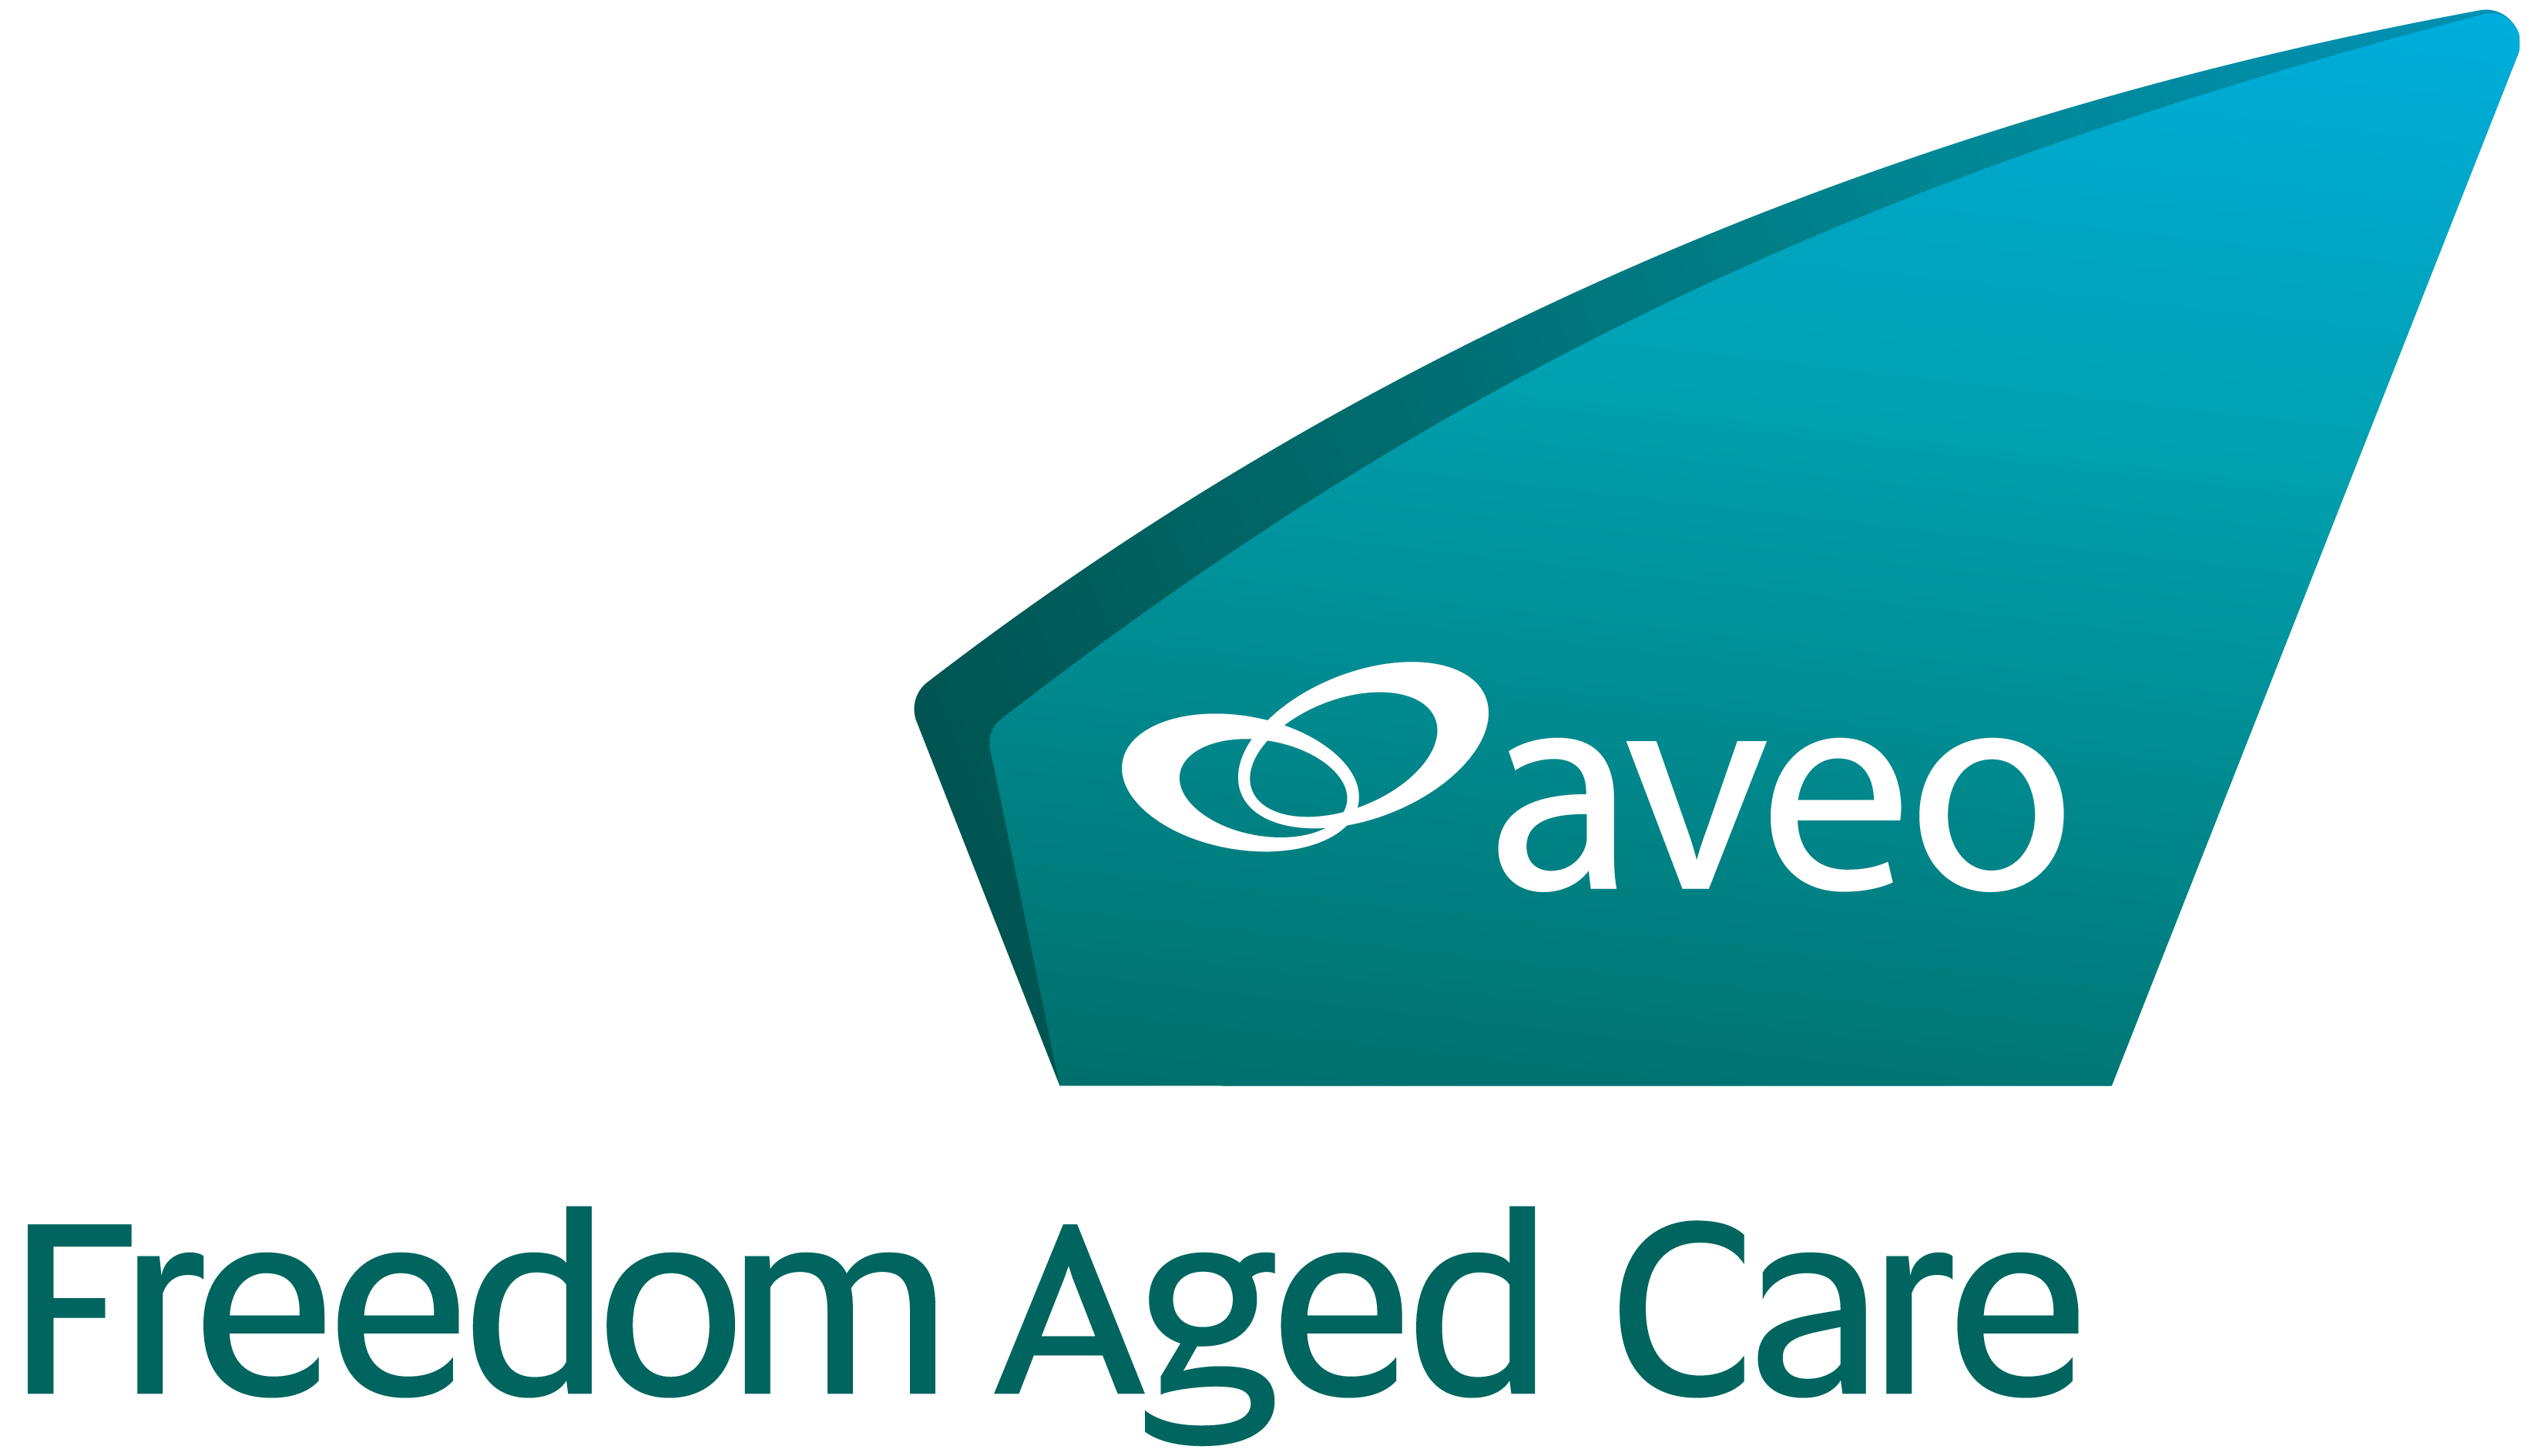 Aveo Freedom Aged Care Coffs Harbour logo